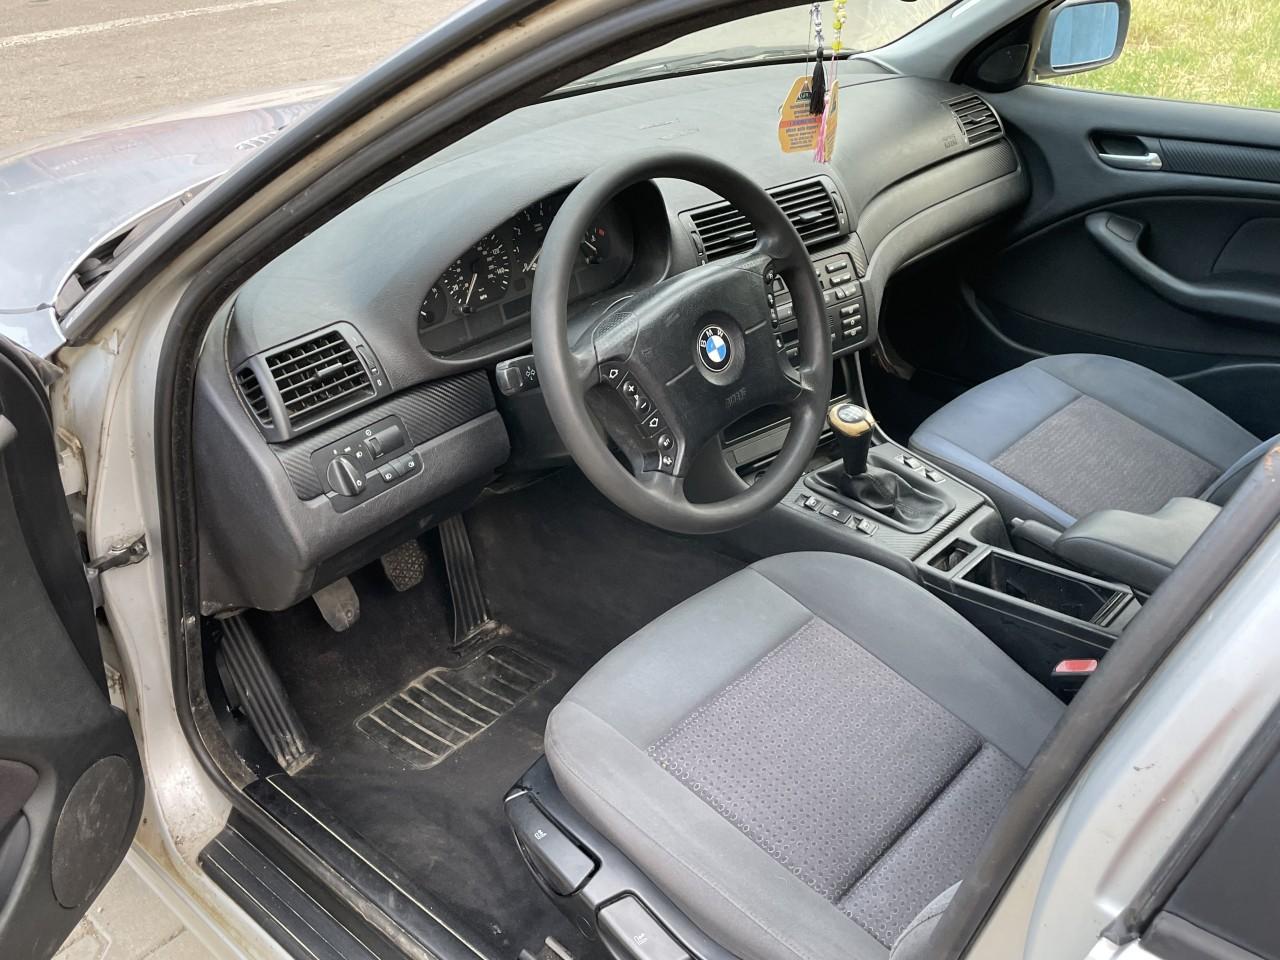 BMW 318 1.9 benzina 2003